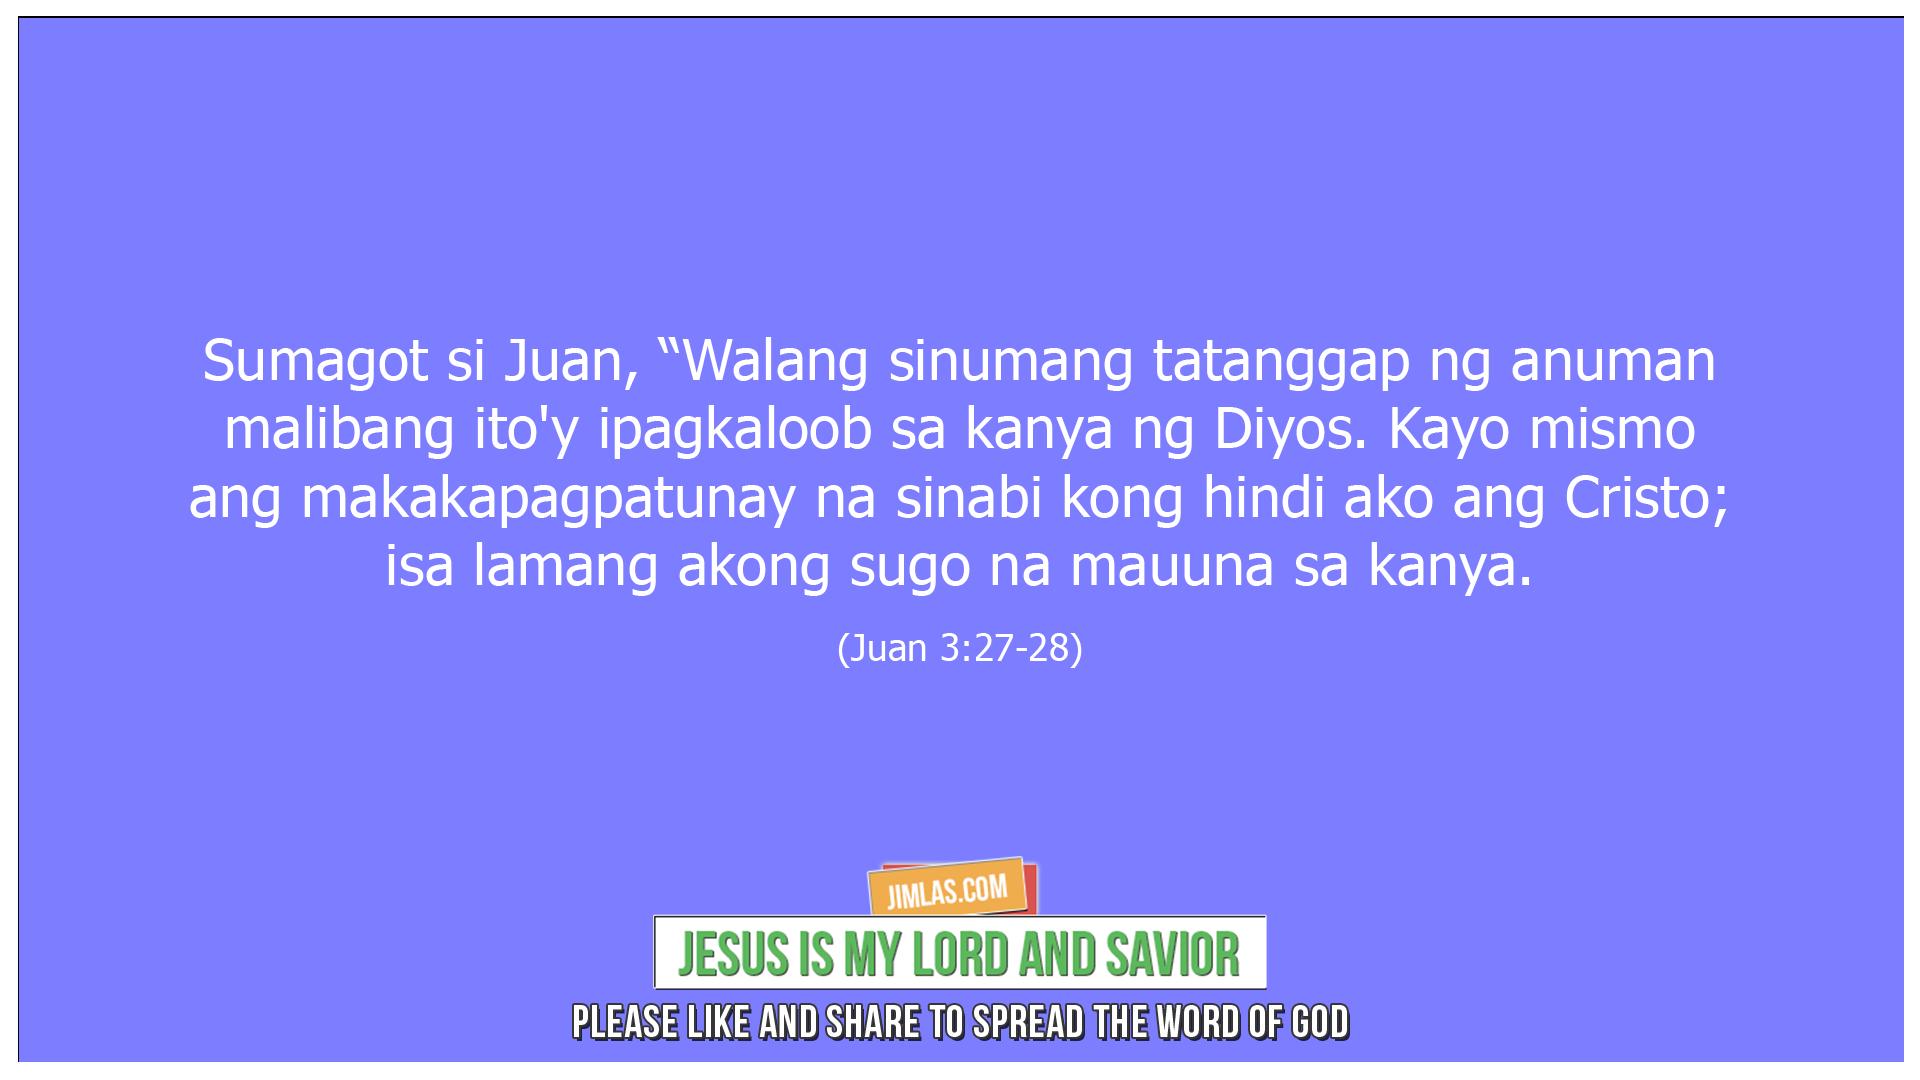 Juan 3-27-28, Juan 3:27-28